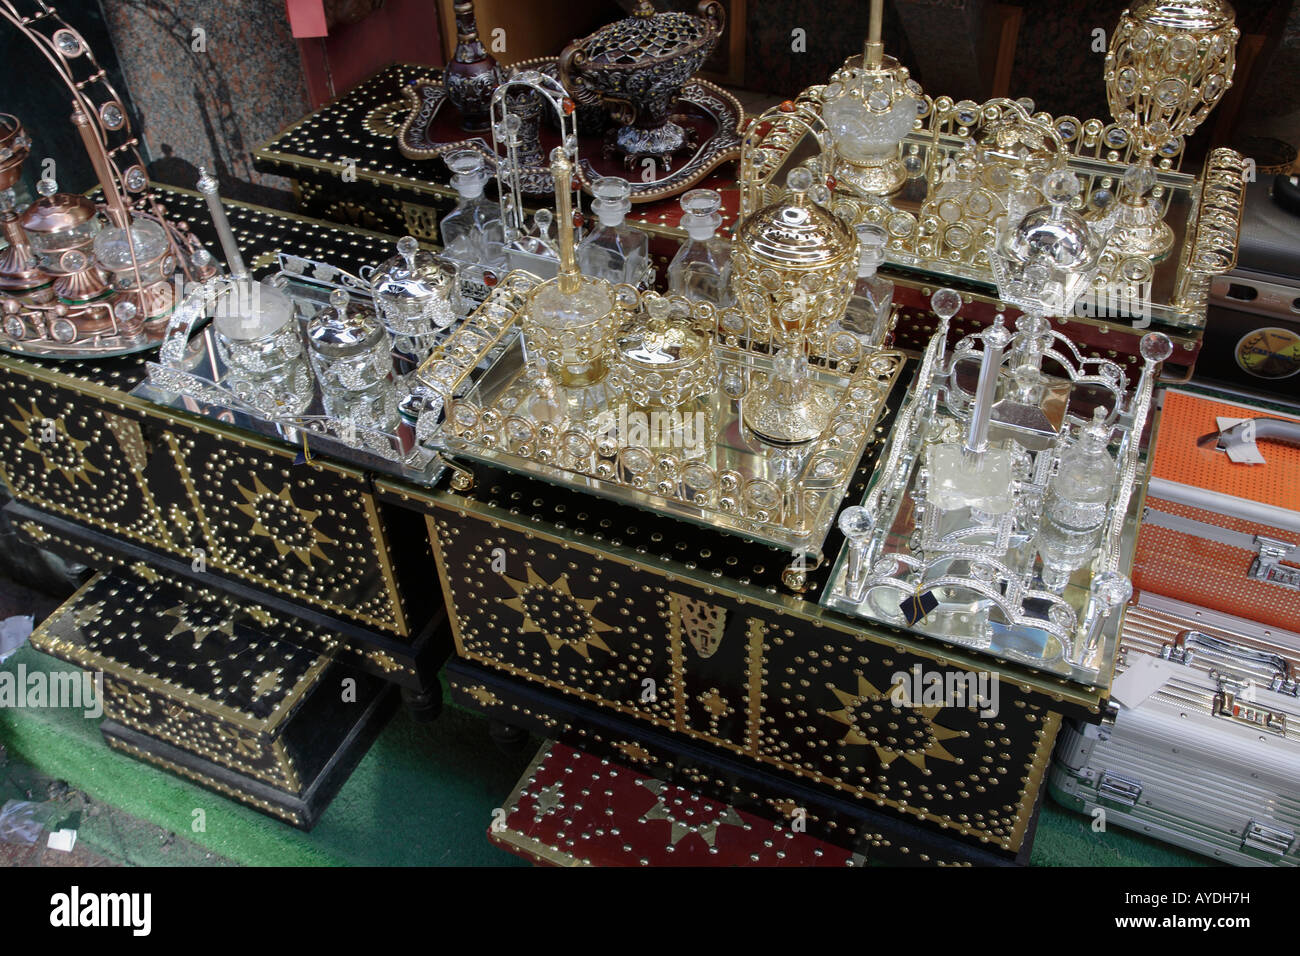 Handicraft Oman Stock Photos Handicraft Oman Stock Images Alamy